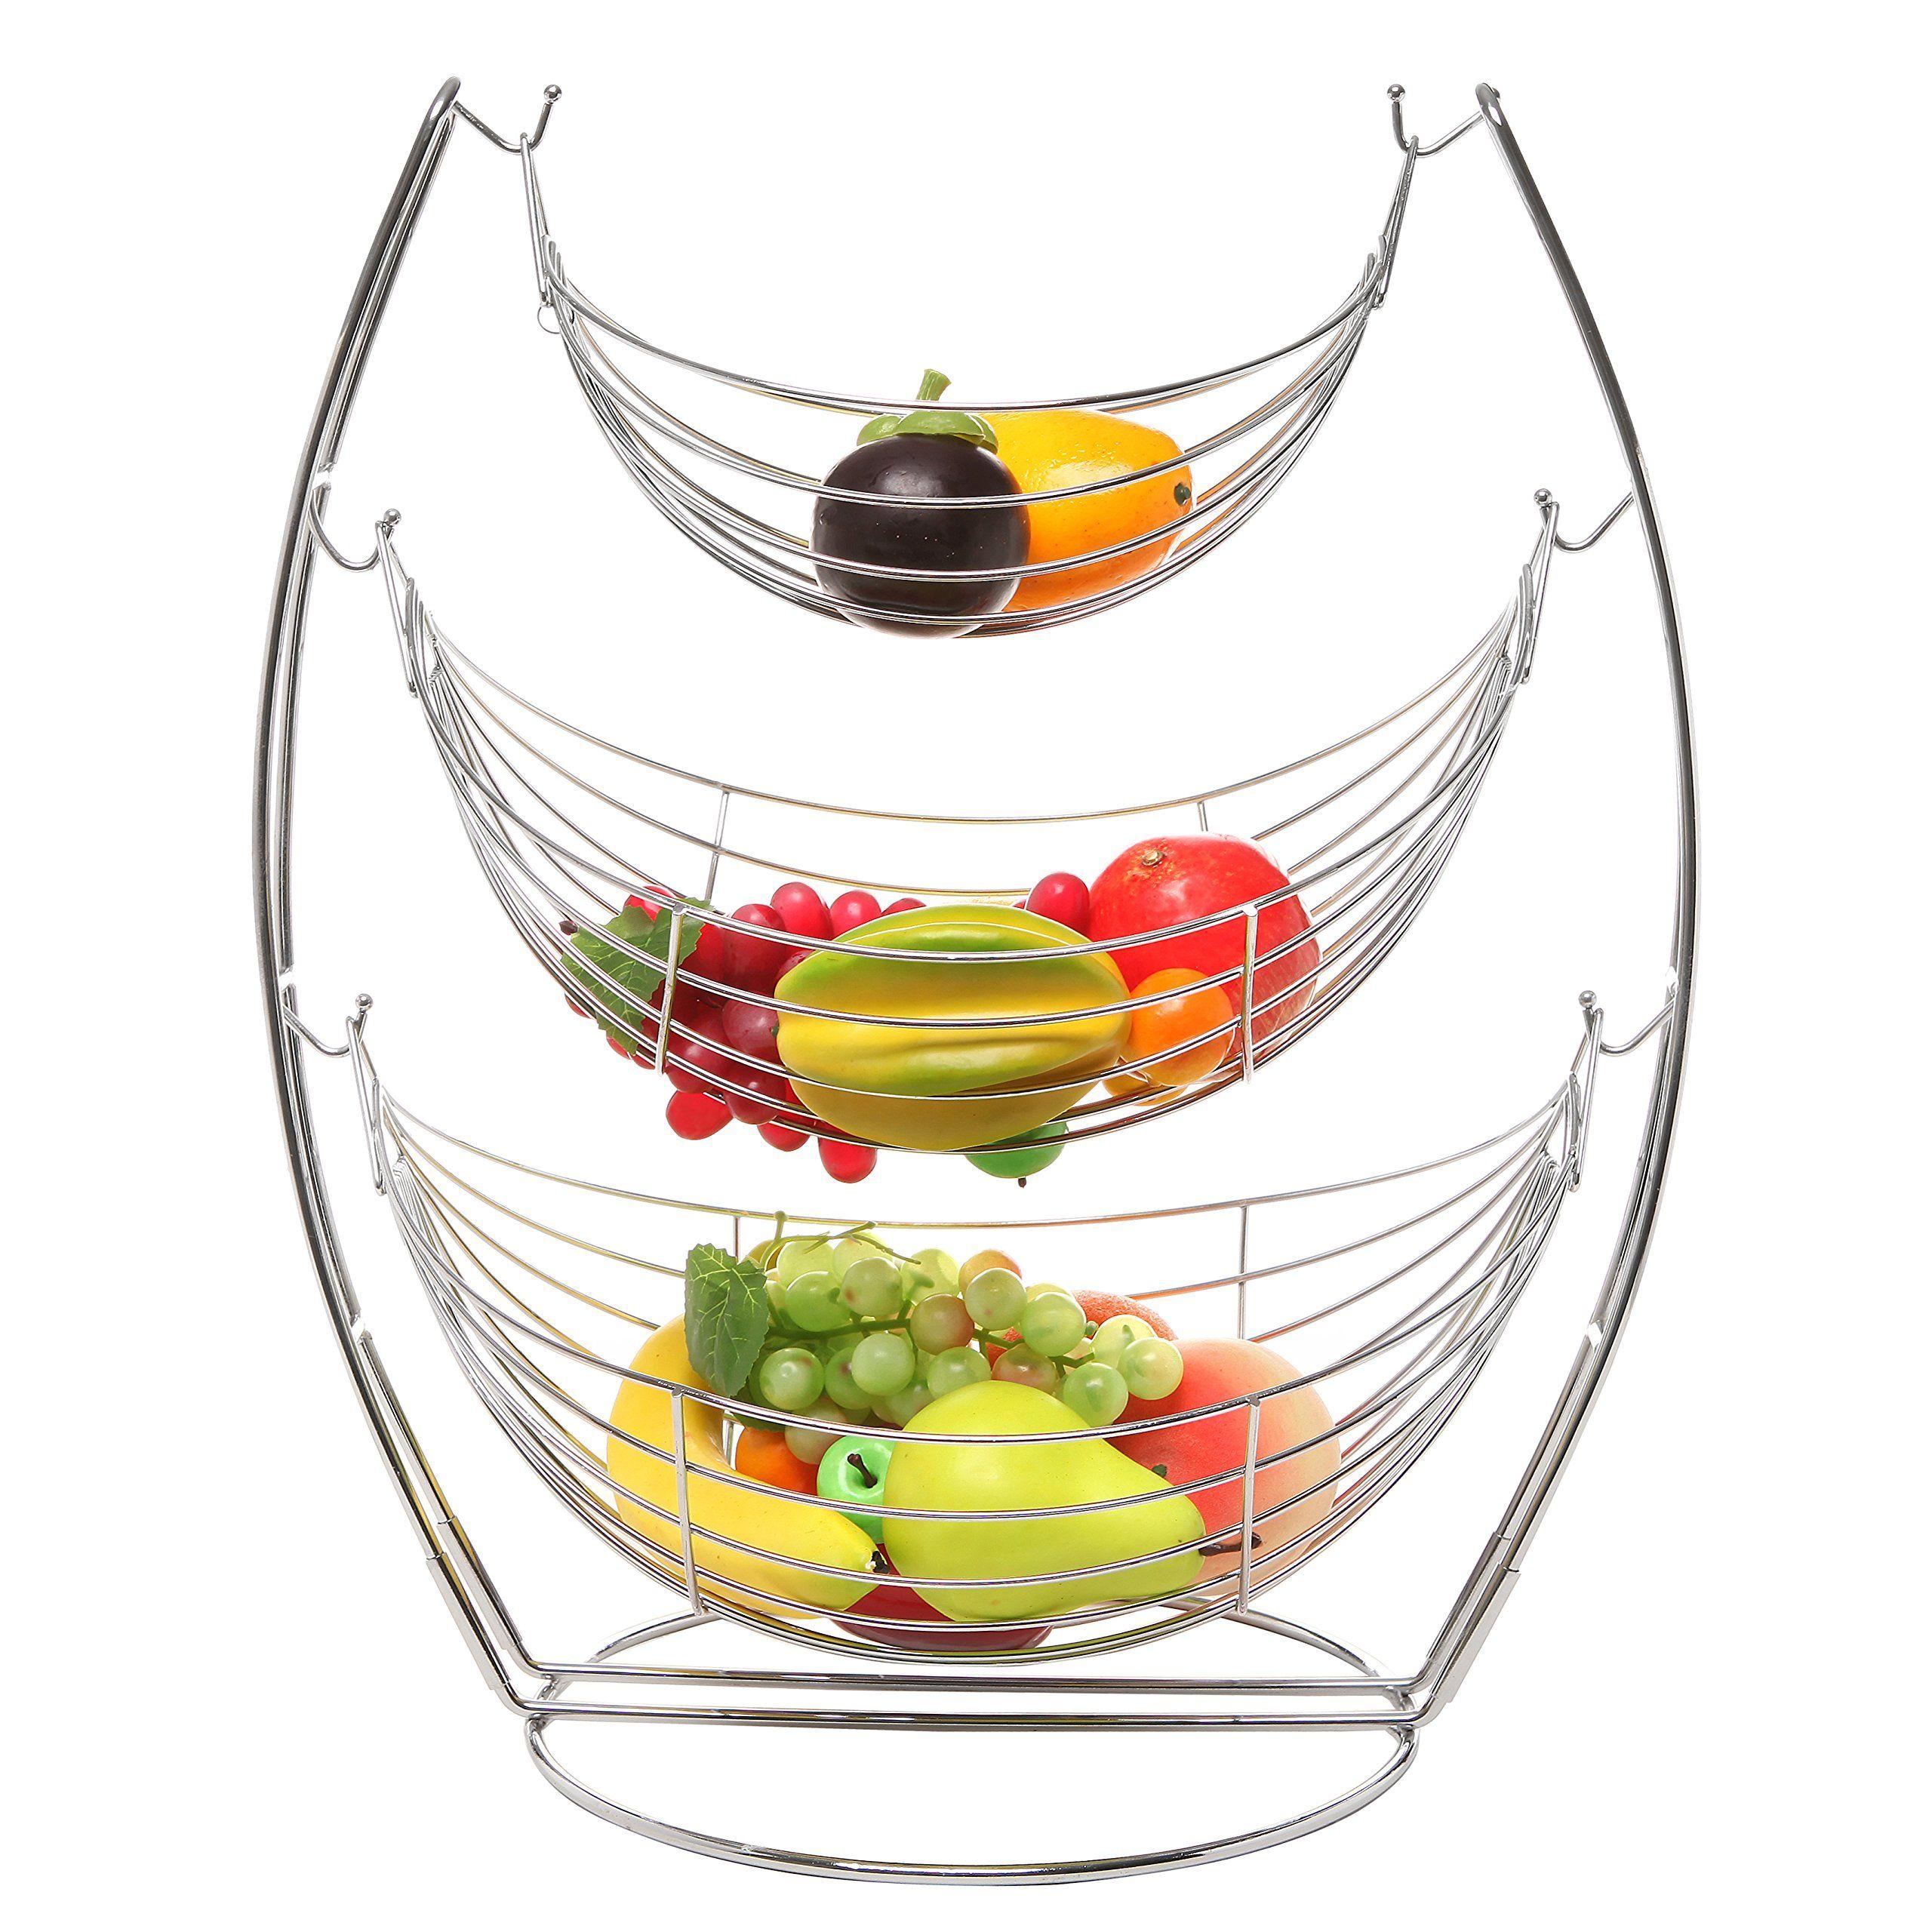 3 tier chrome triple hammock fruit   vegetables   produce metal basket rack display stand   3 tier chrome triple hammock fruit   vegetables   produce metal      rh   pinterest